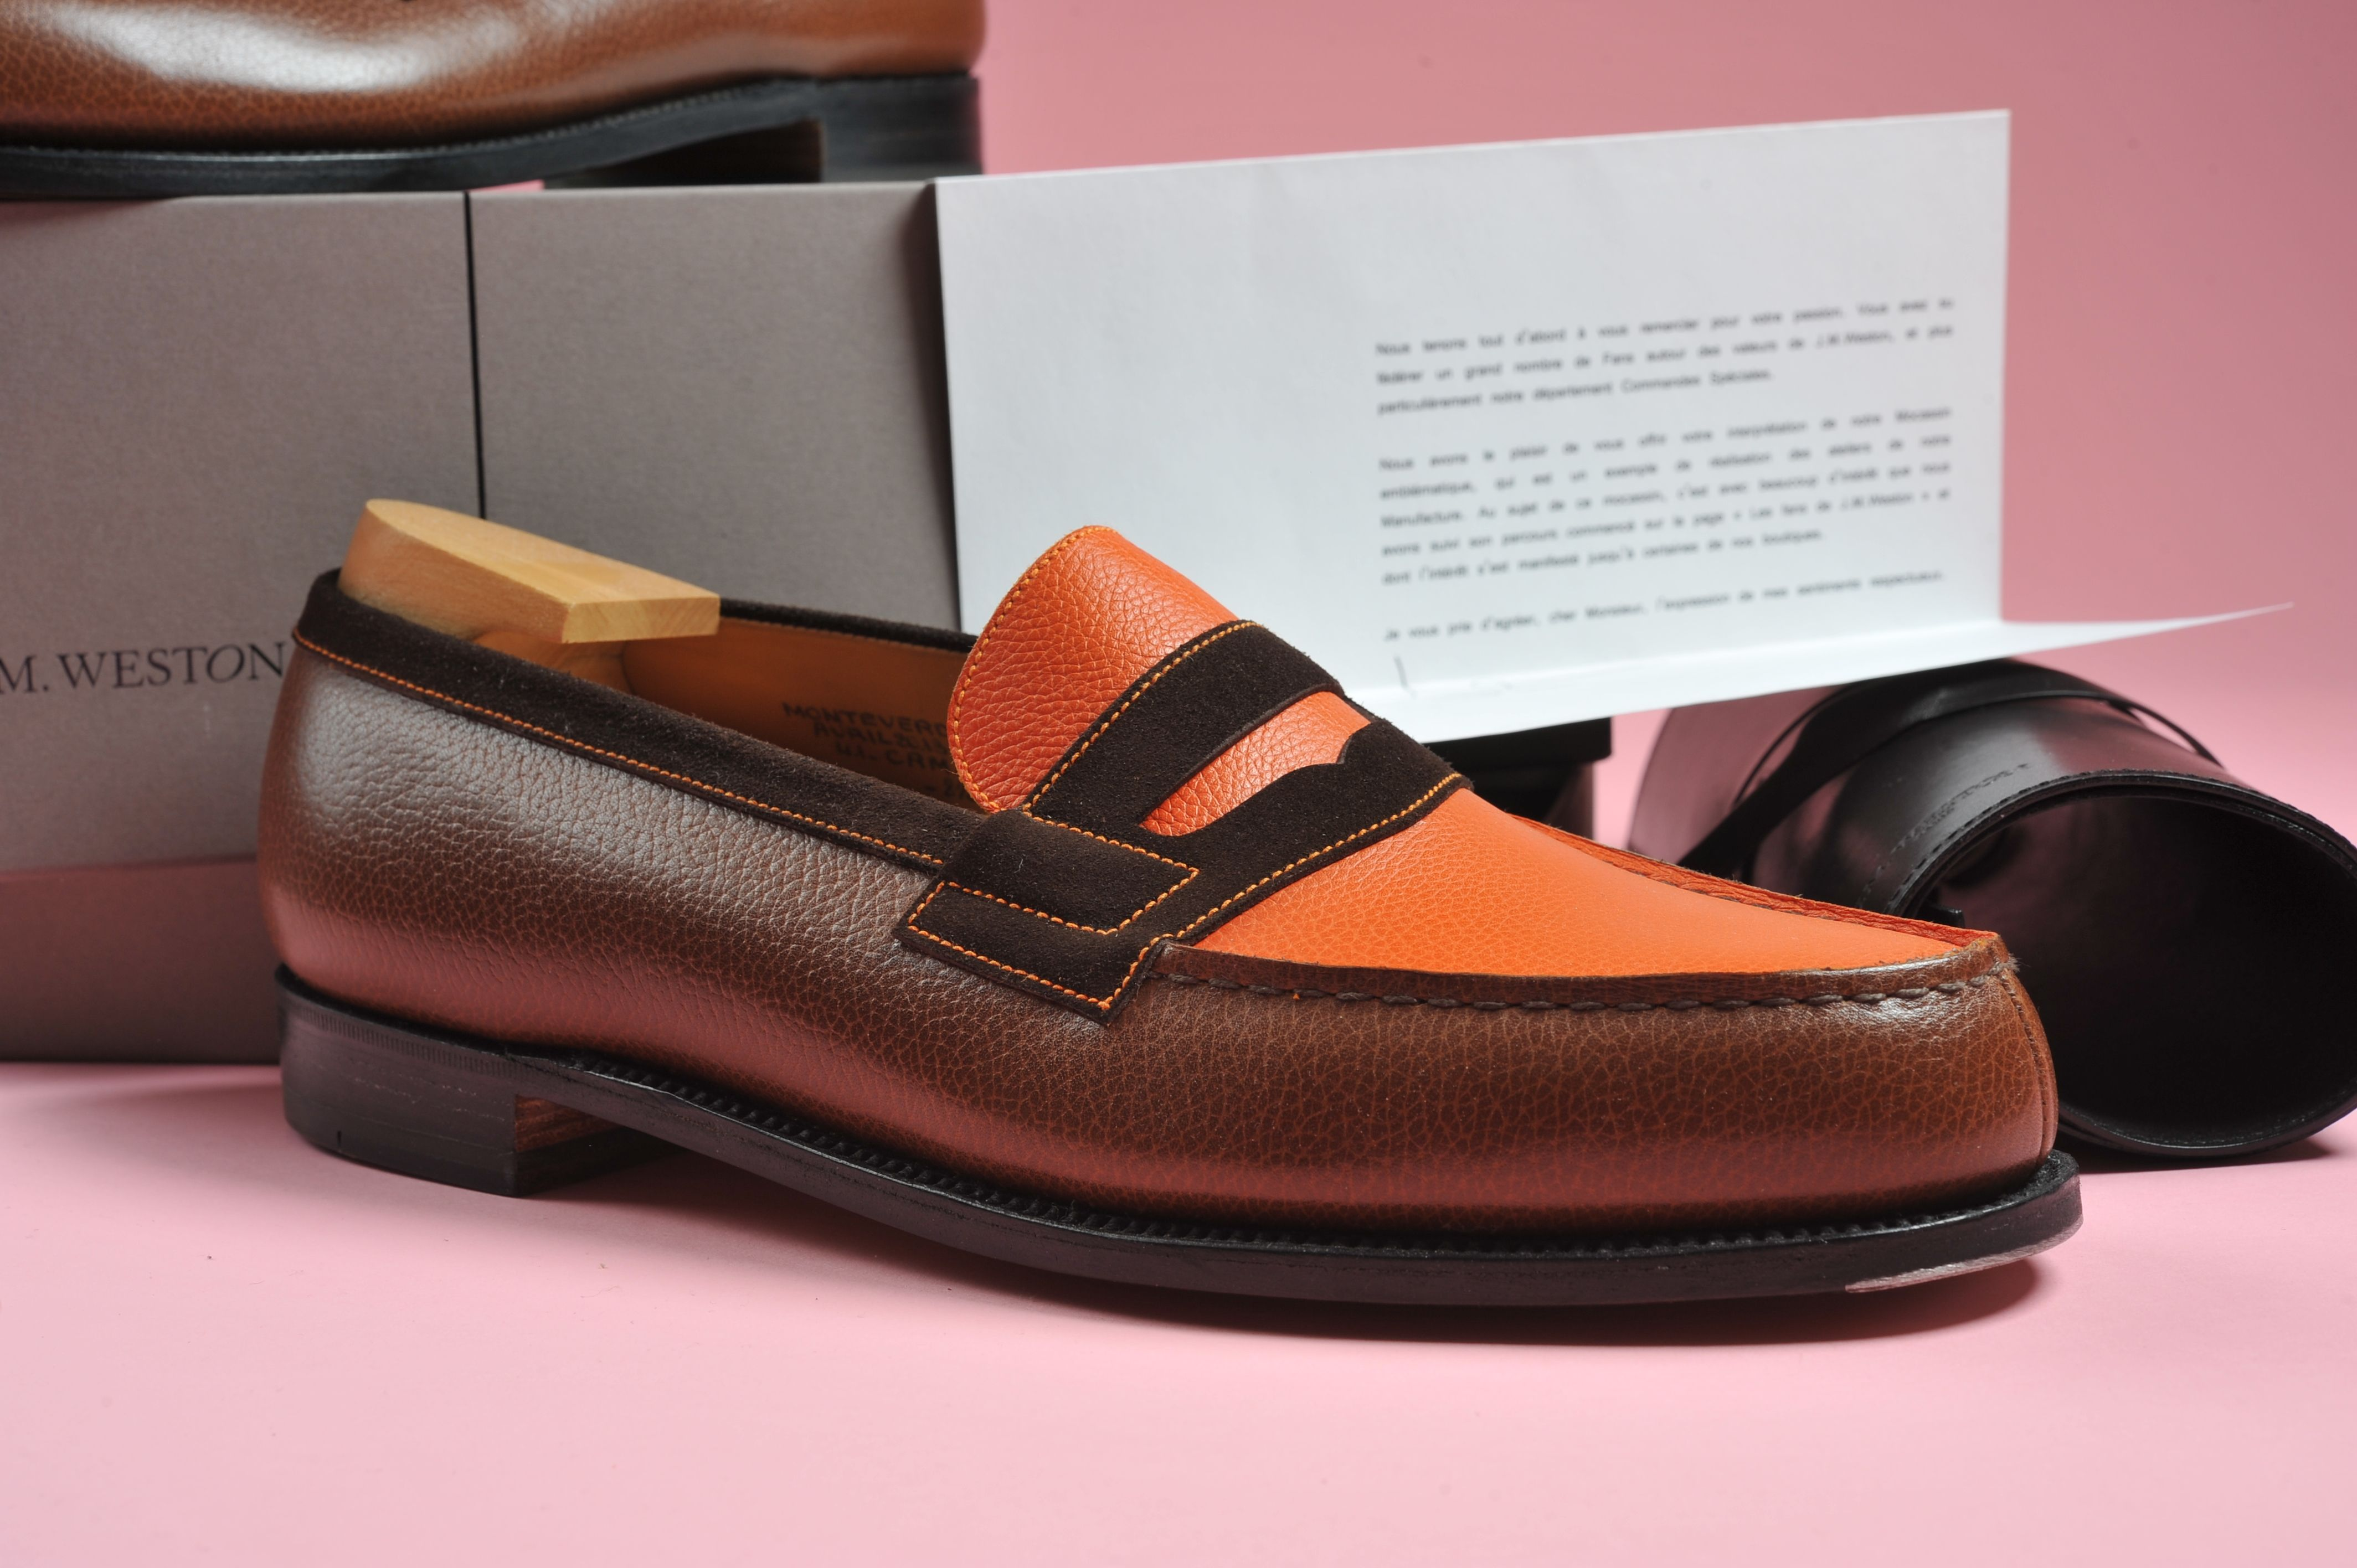 c78c0b25f91 J.M. Weston loafer 180 Safari. Special order.